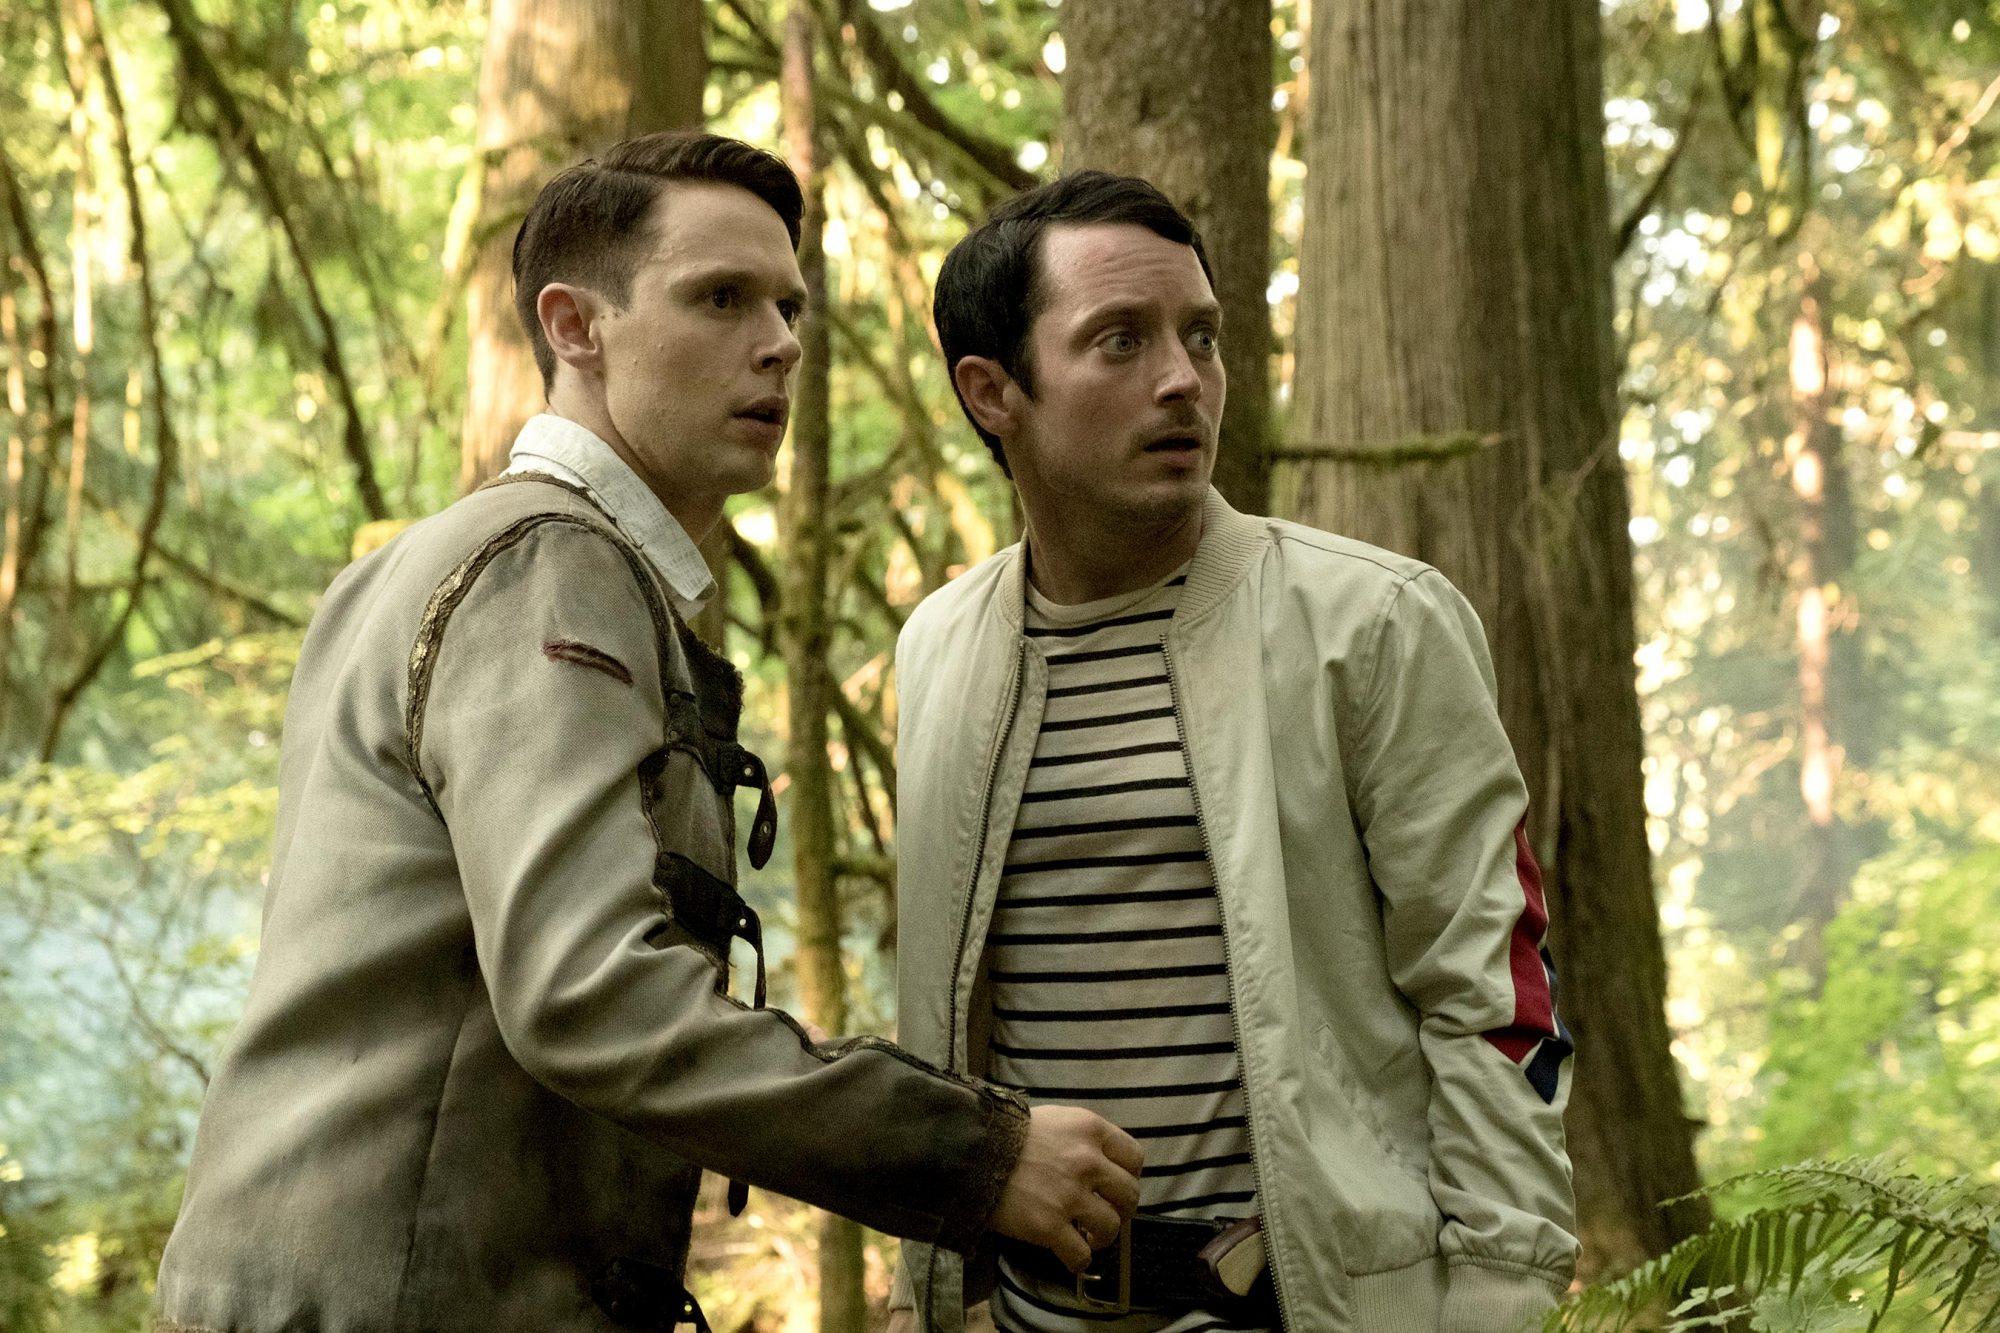 Dirk Gently (Samuel Barnett), Todd Brotzman (Elijah Wood)